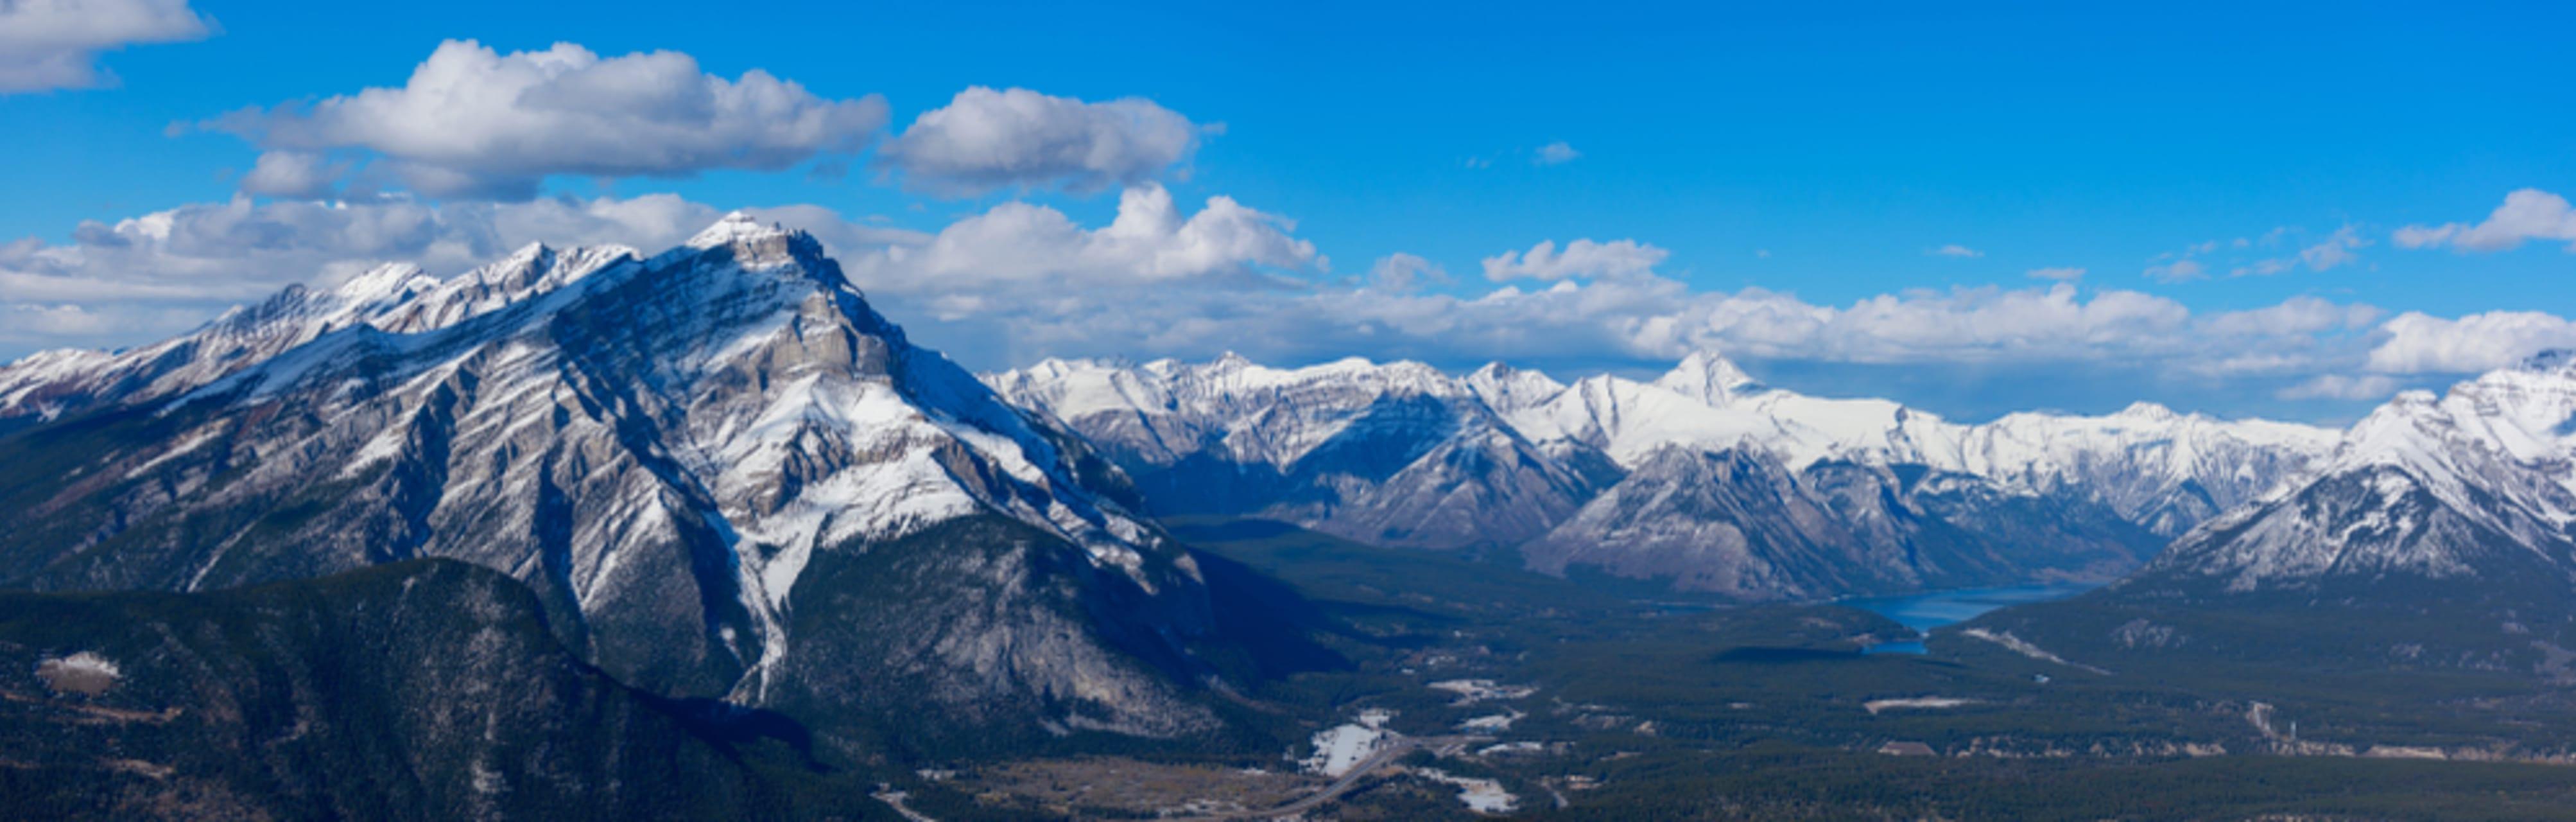 Banff cover image